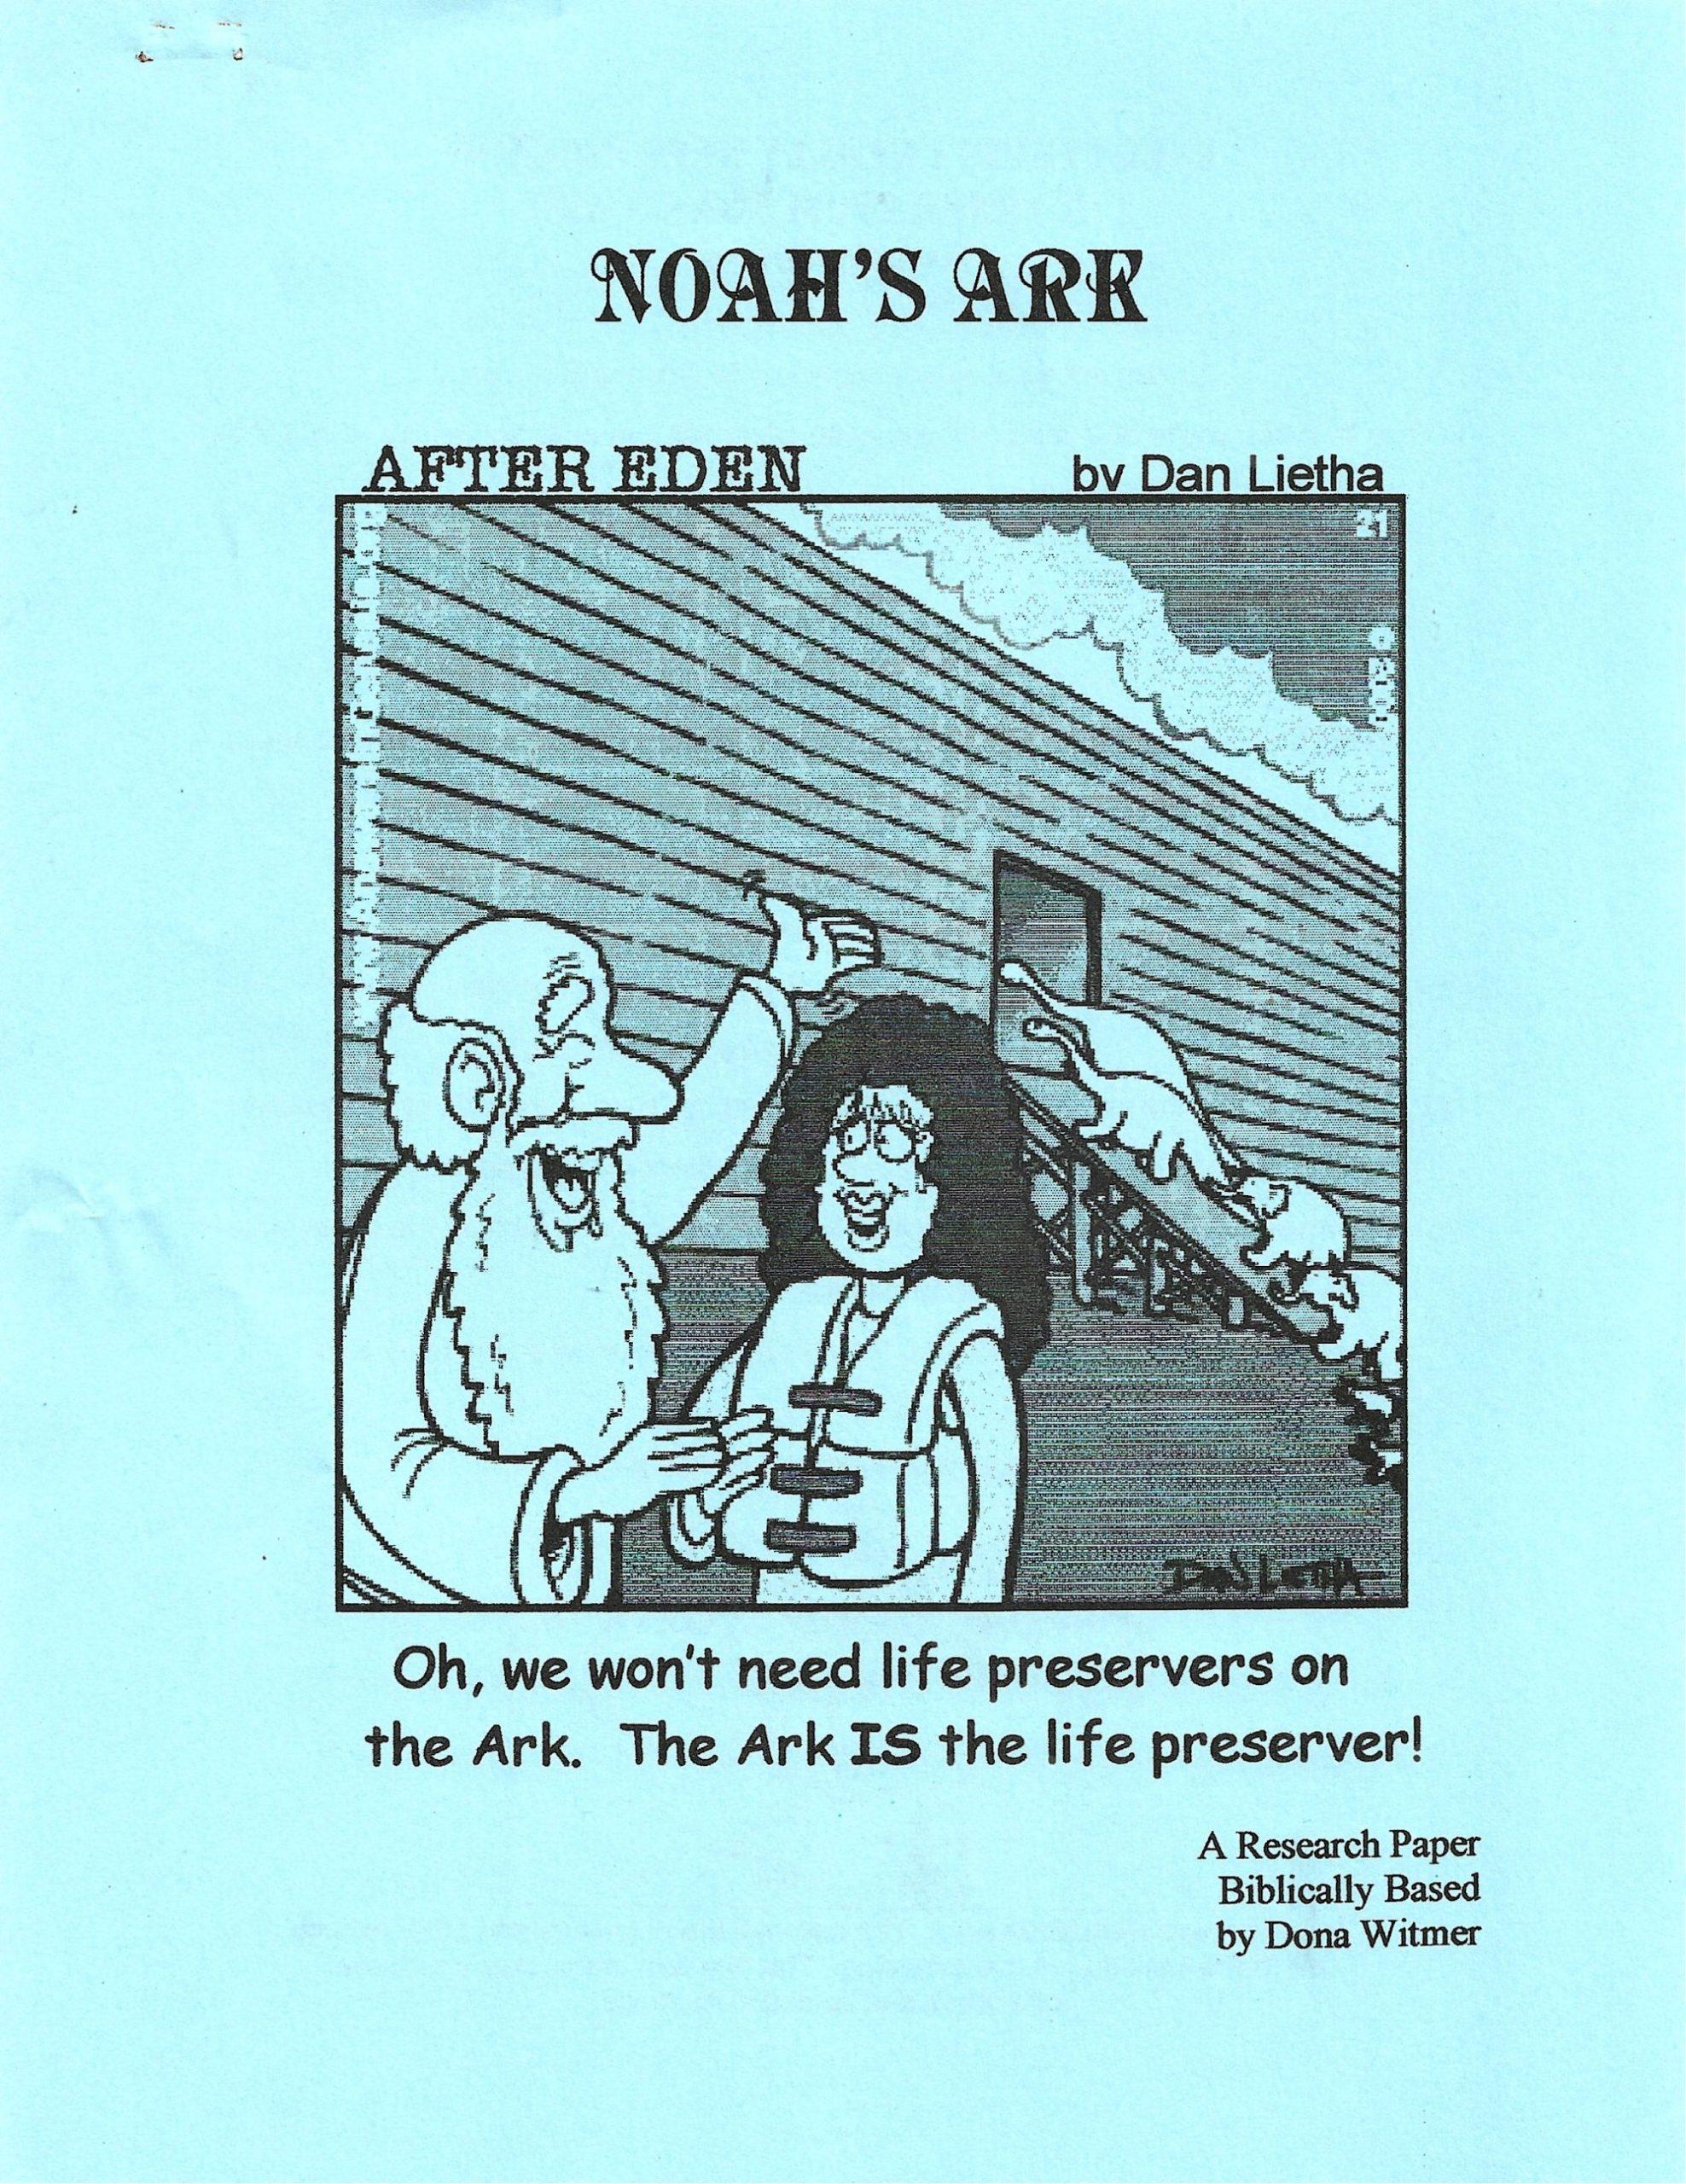 Noah's Ark Research Paper